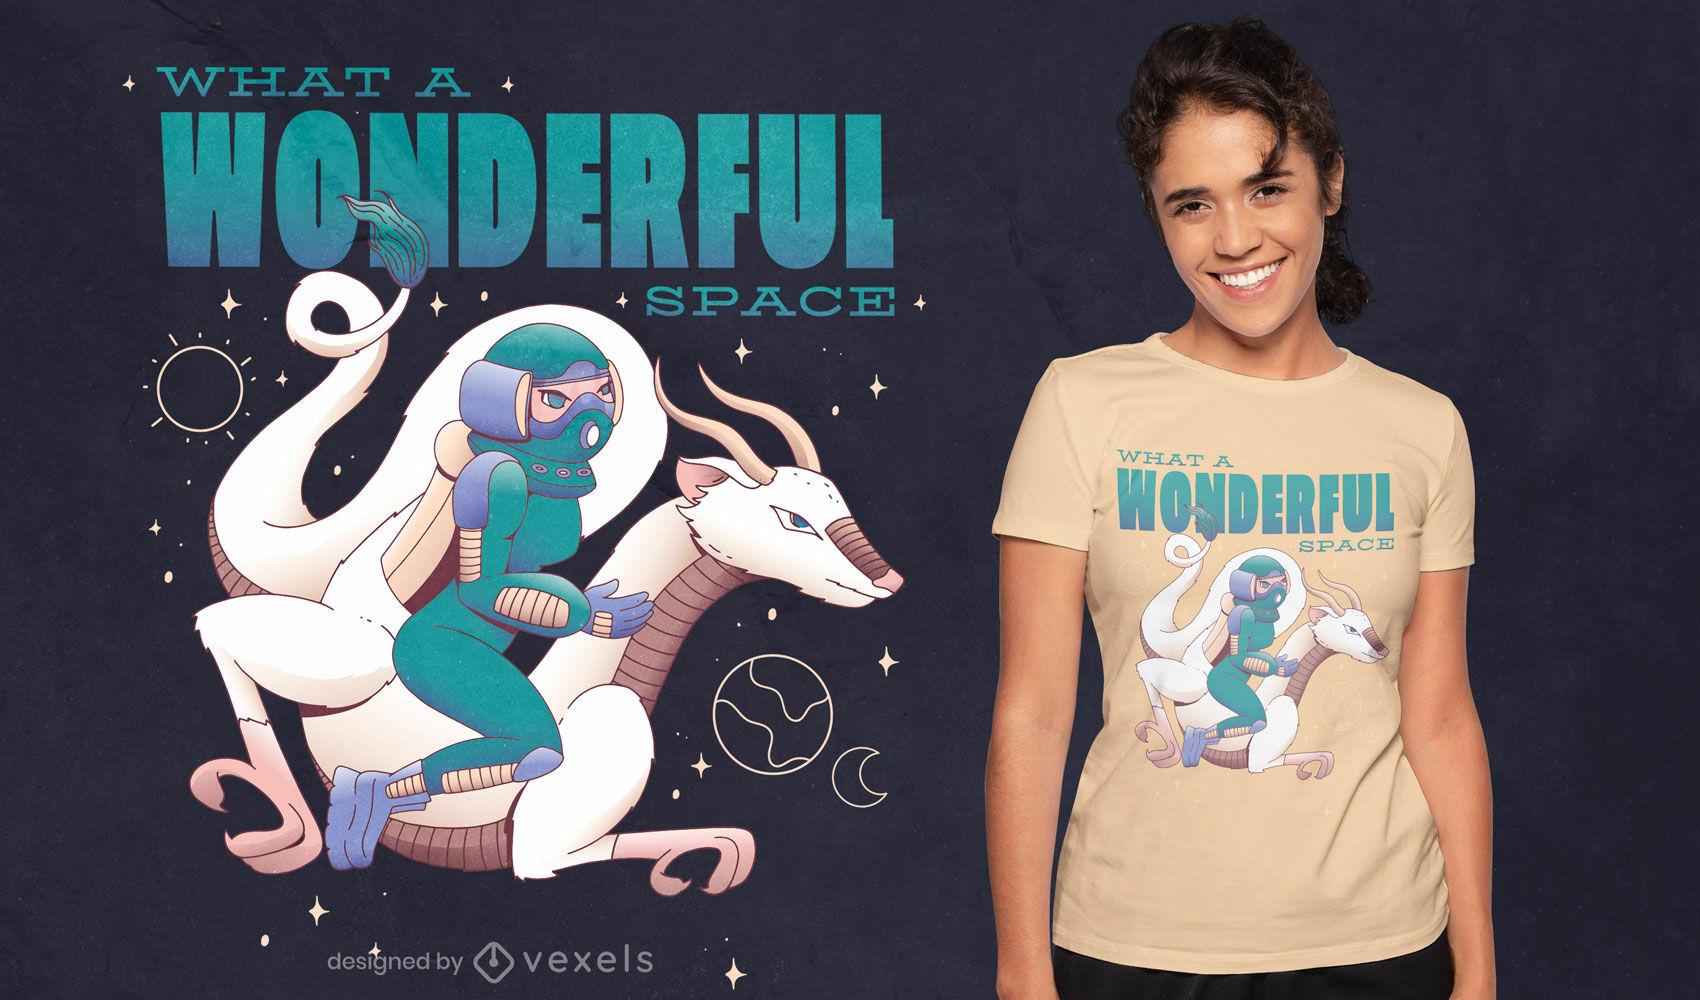 Astronaut creature space t-shirt design